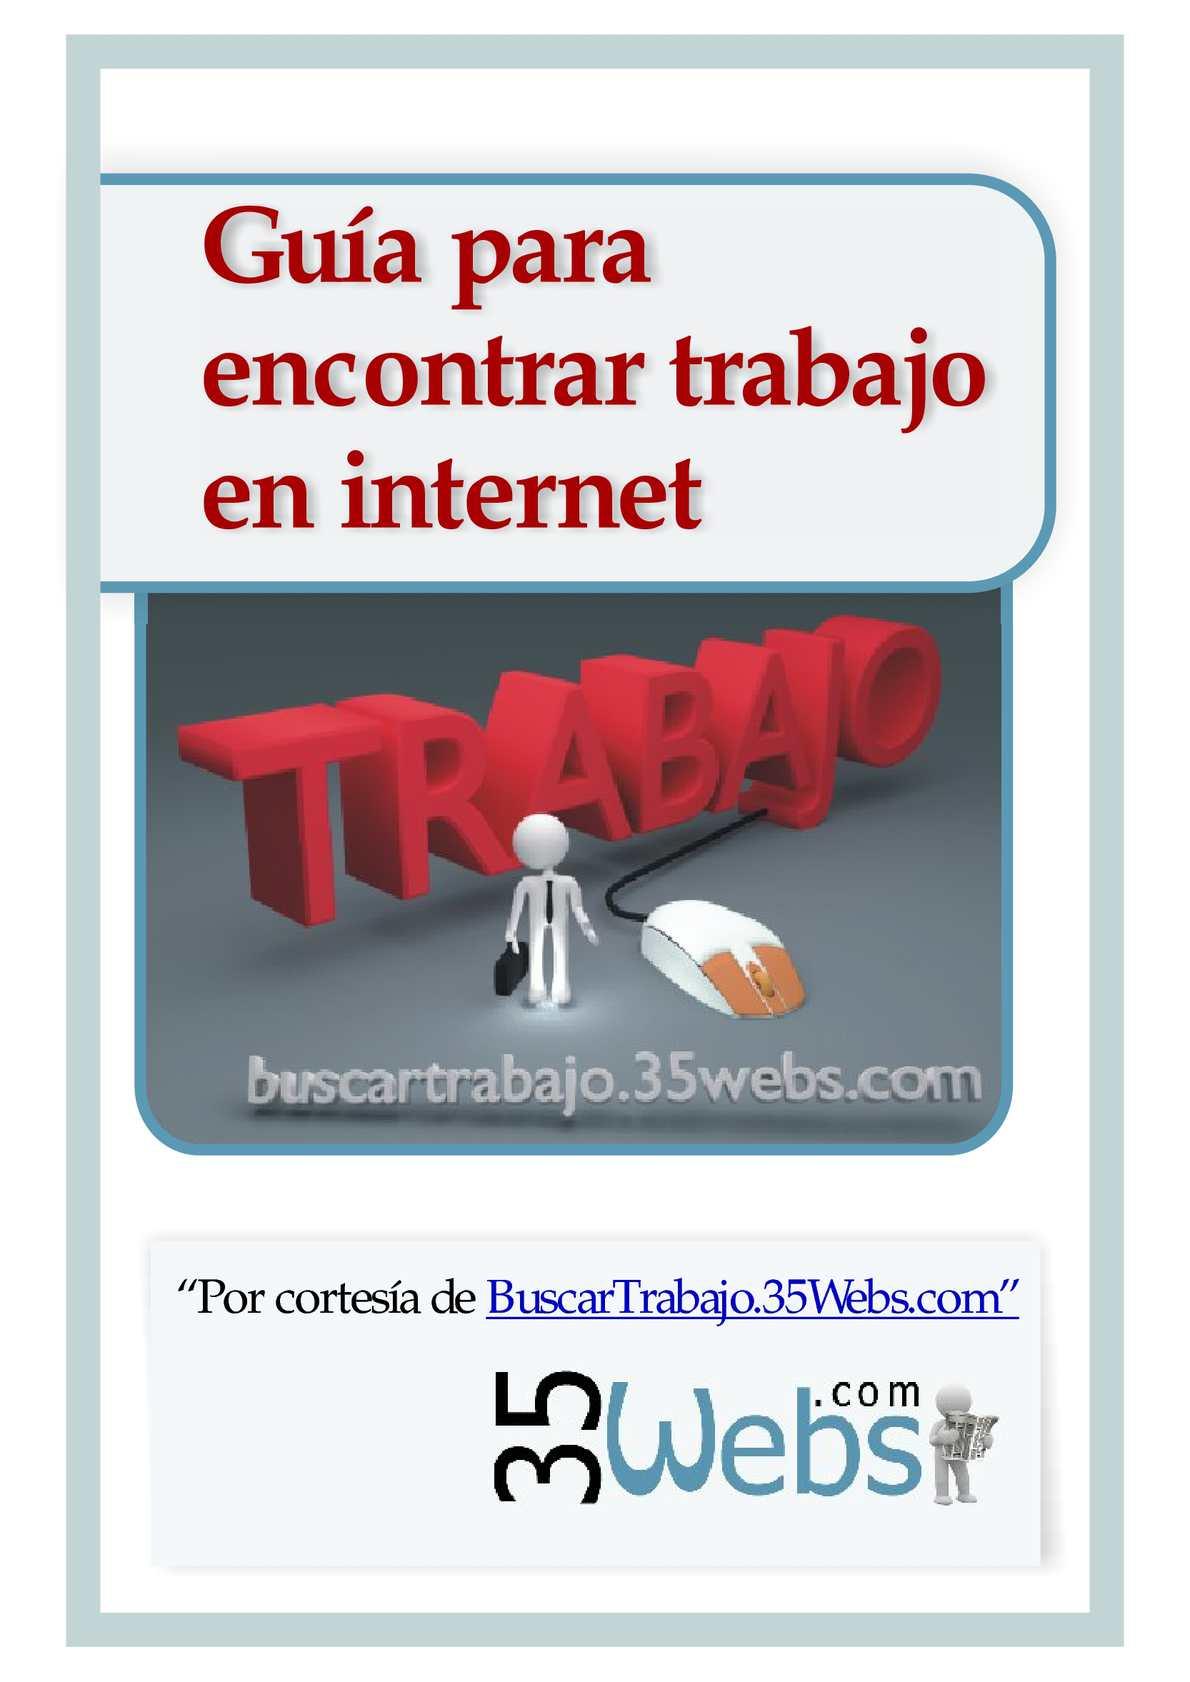 Calaméo - Guia para encontrar trabajo en internet